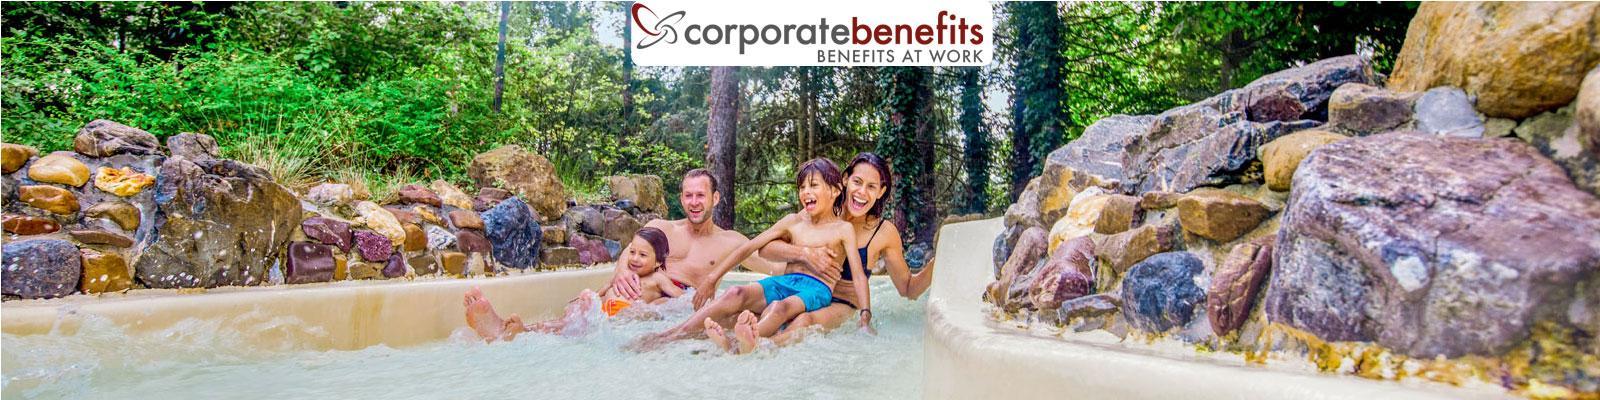 logo corporate benefits